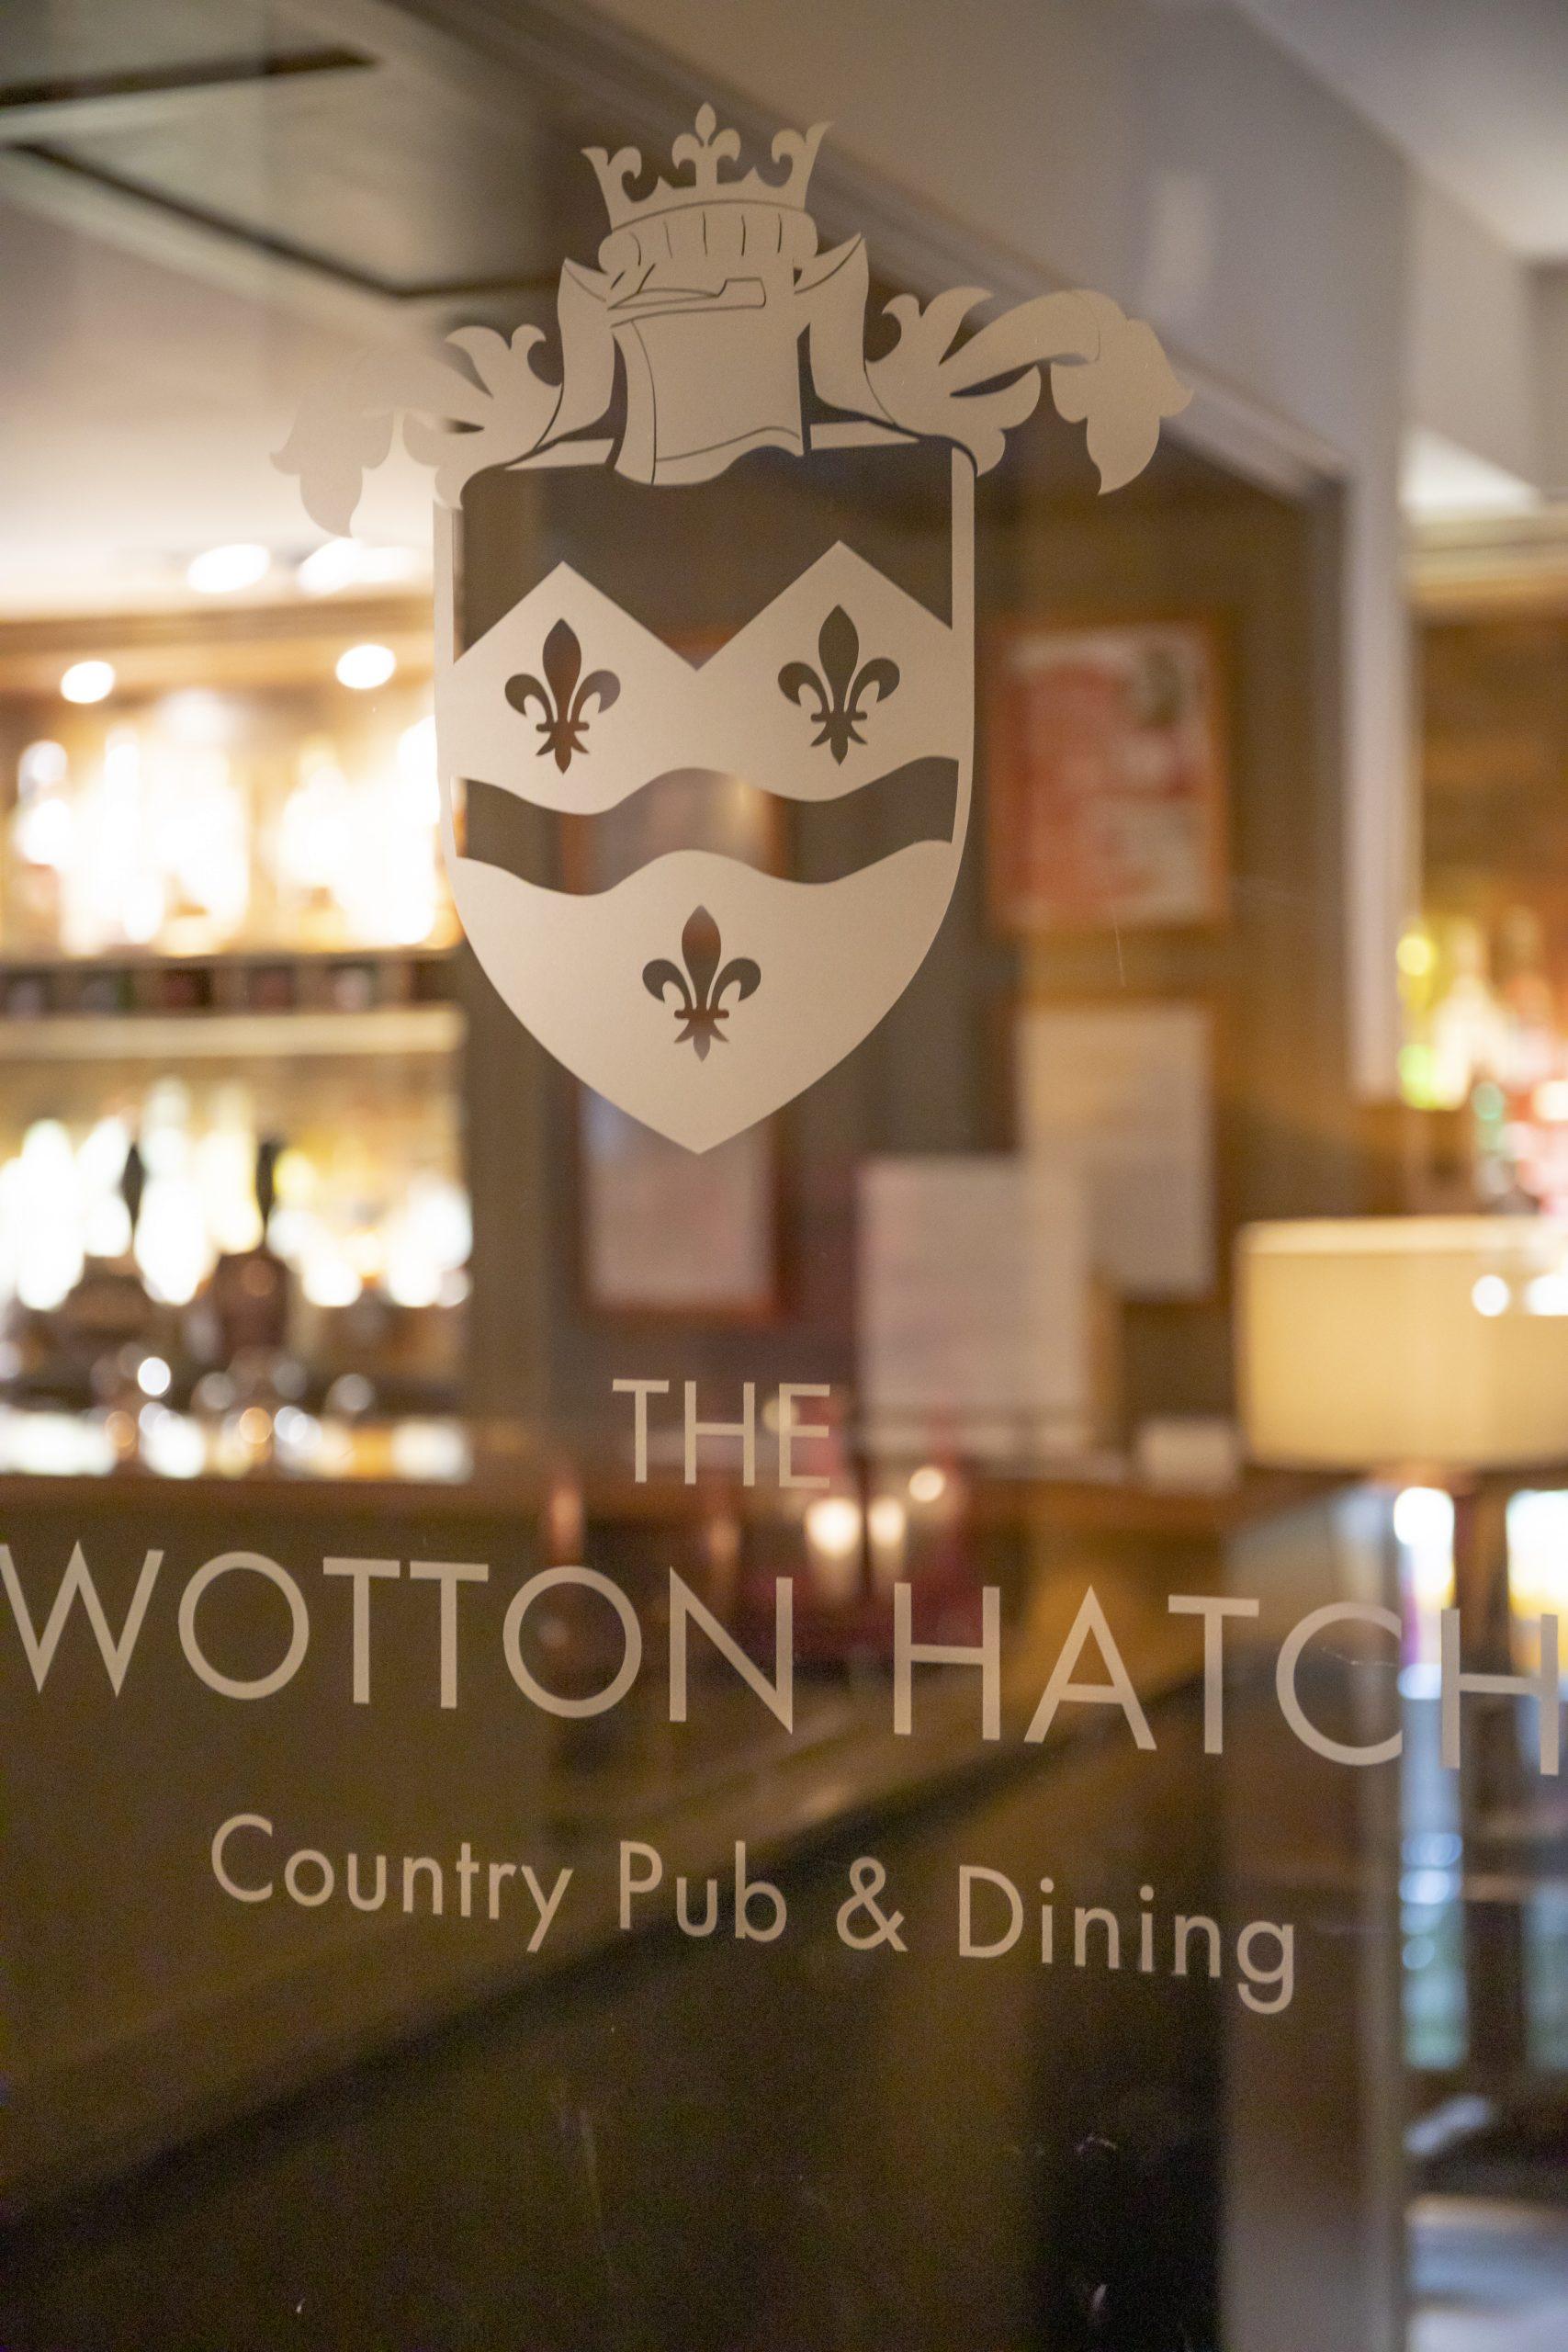 The Wotton Hatch